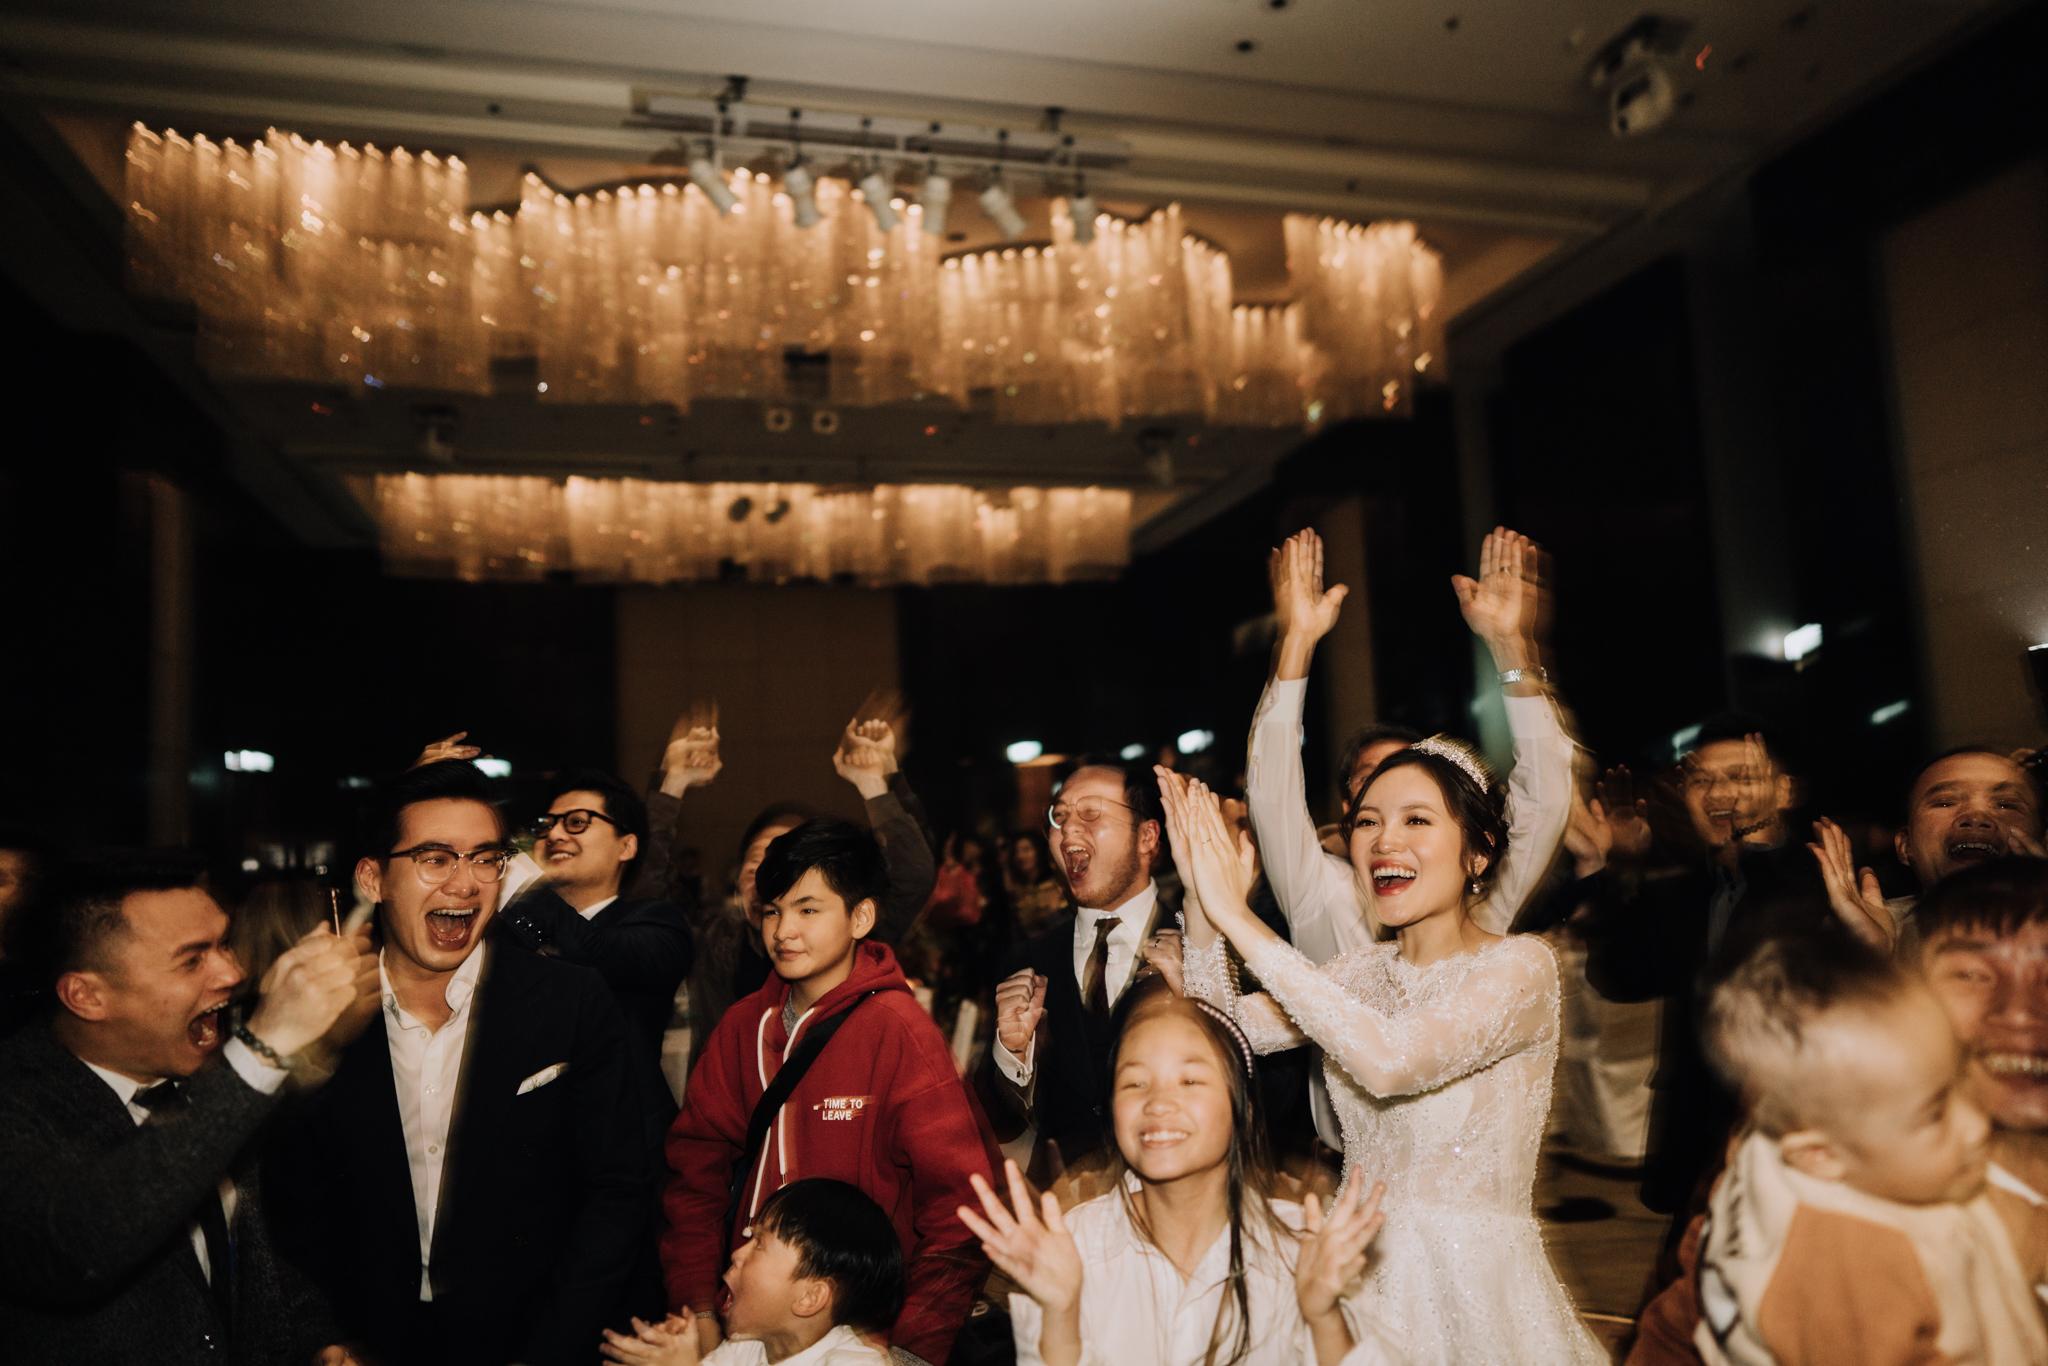 JWMarriott Ha Noi Intimate Wedding of Trang Hi well captured by Hipster Wedding Vietnam Wedding Photographer-36727.jpg